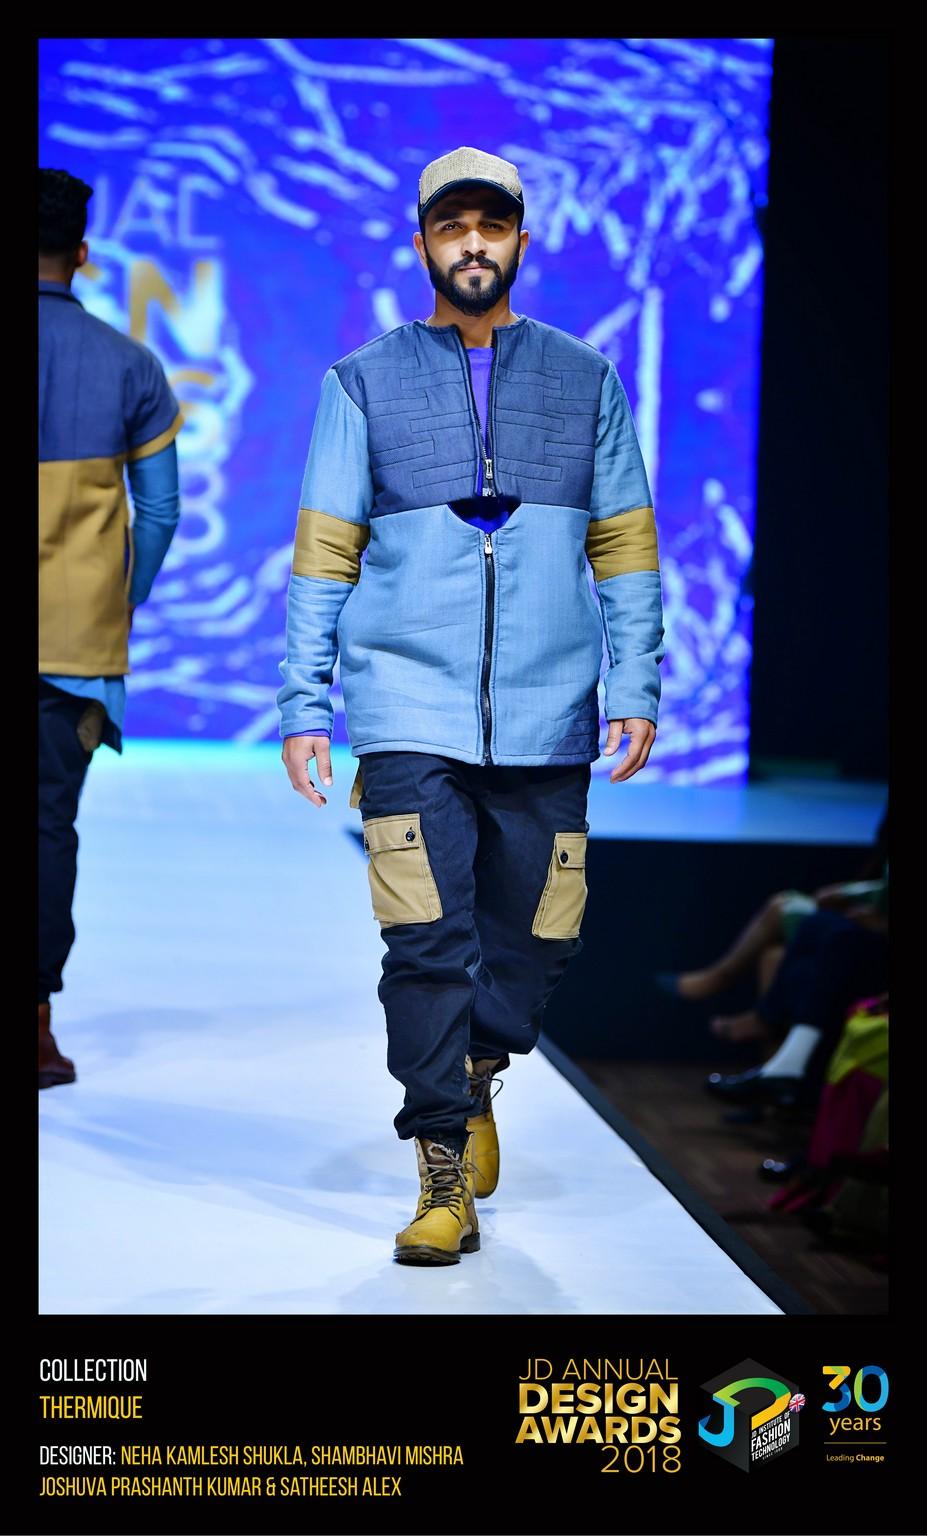 Thermique – Change – JD Annual Design Awards 2018 | Designer: Shambhavi, Neha and satish | Photography : Jerin Nath (@jerin_nath) thermique Thermique – Change – JD Annual Design Awards 2018 THERMIQUE 3